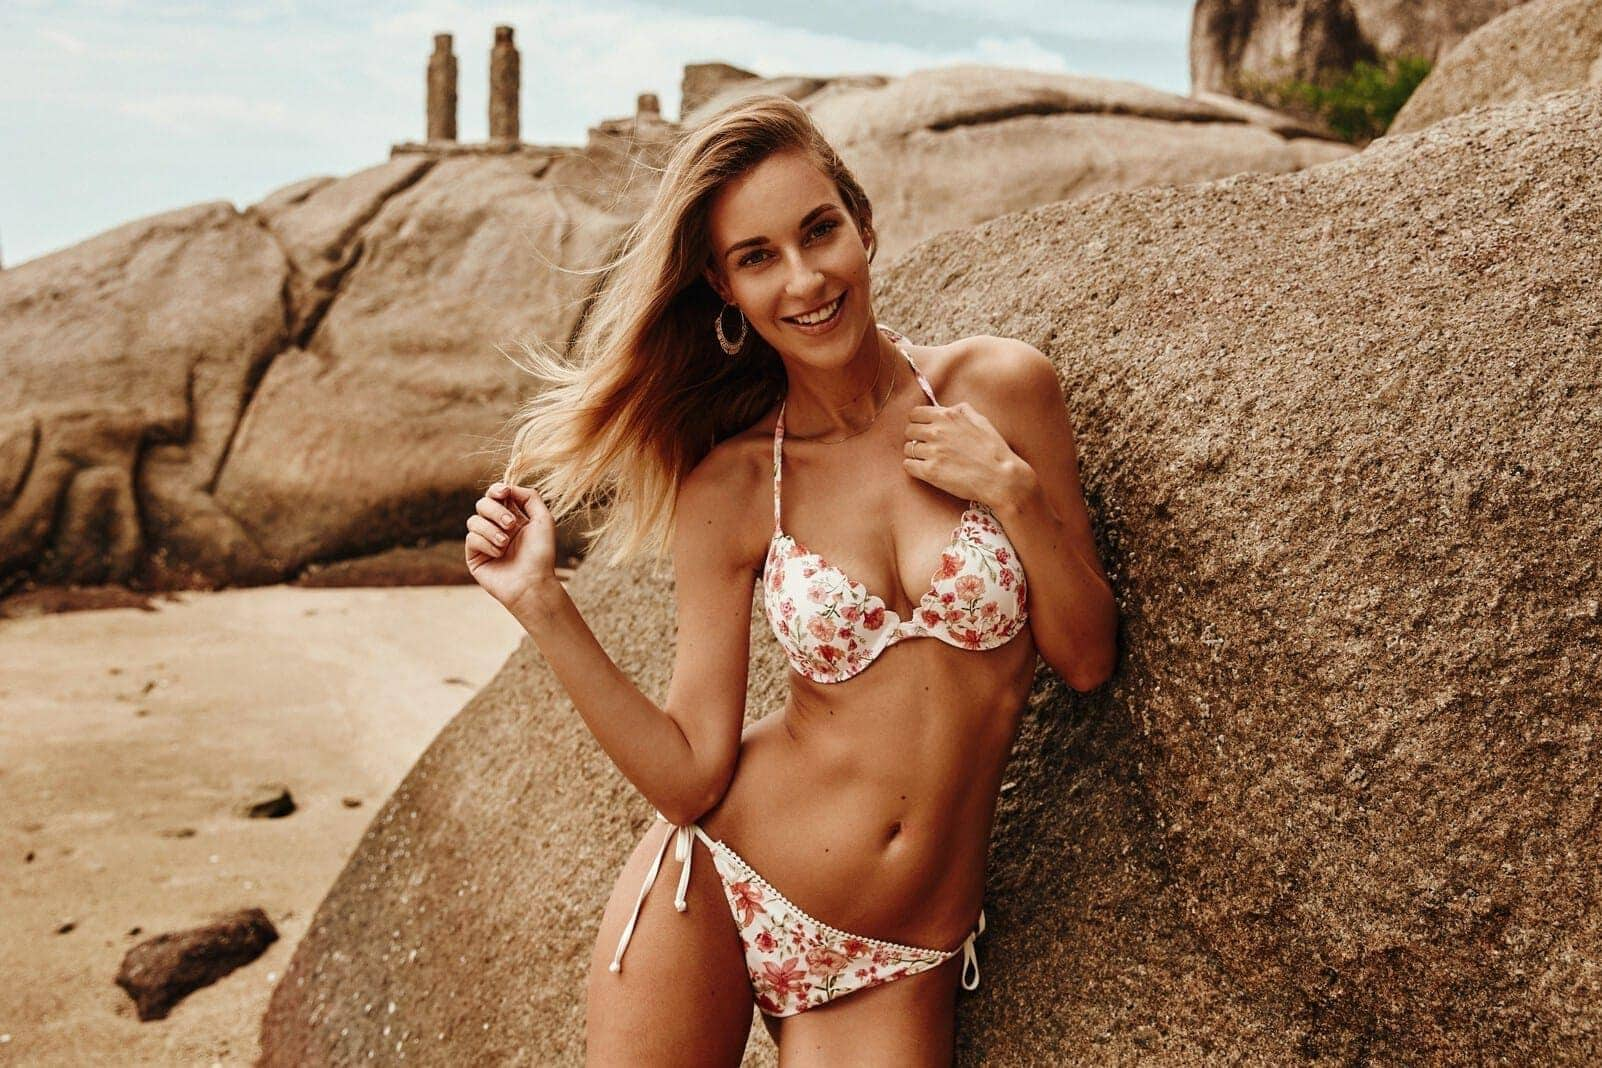 Kimberley Bachelor in Paradise